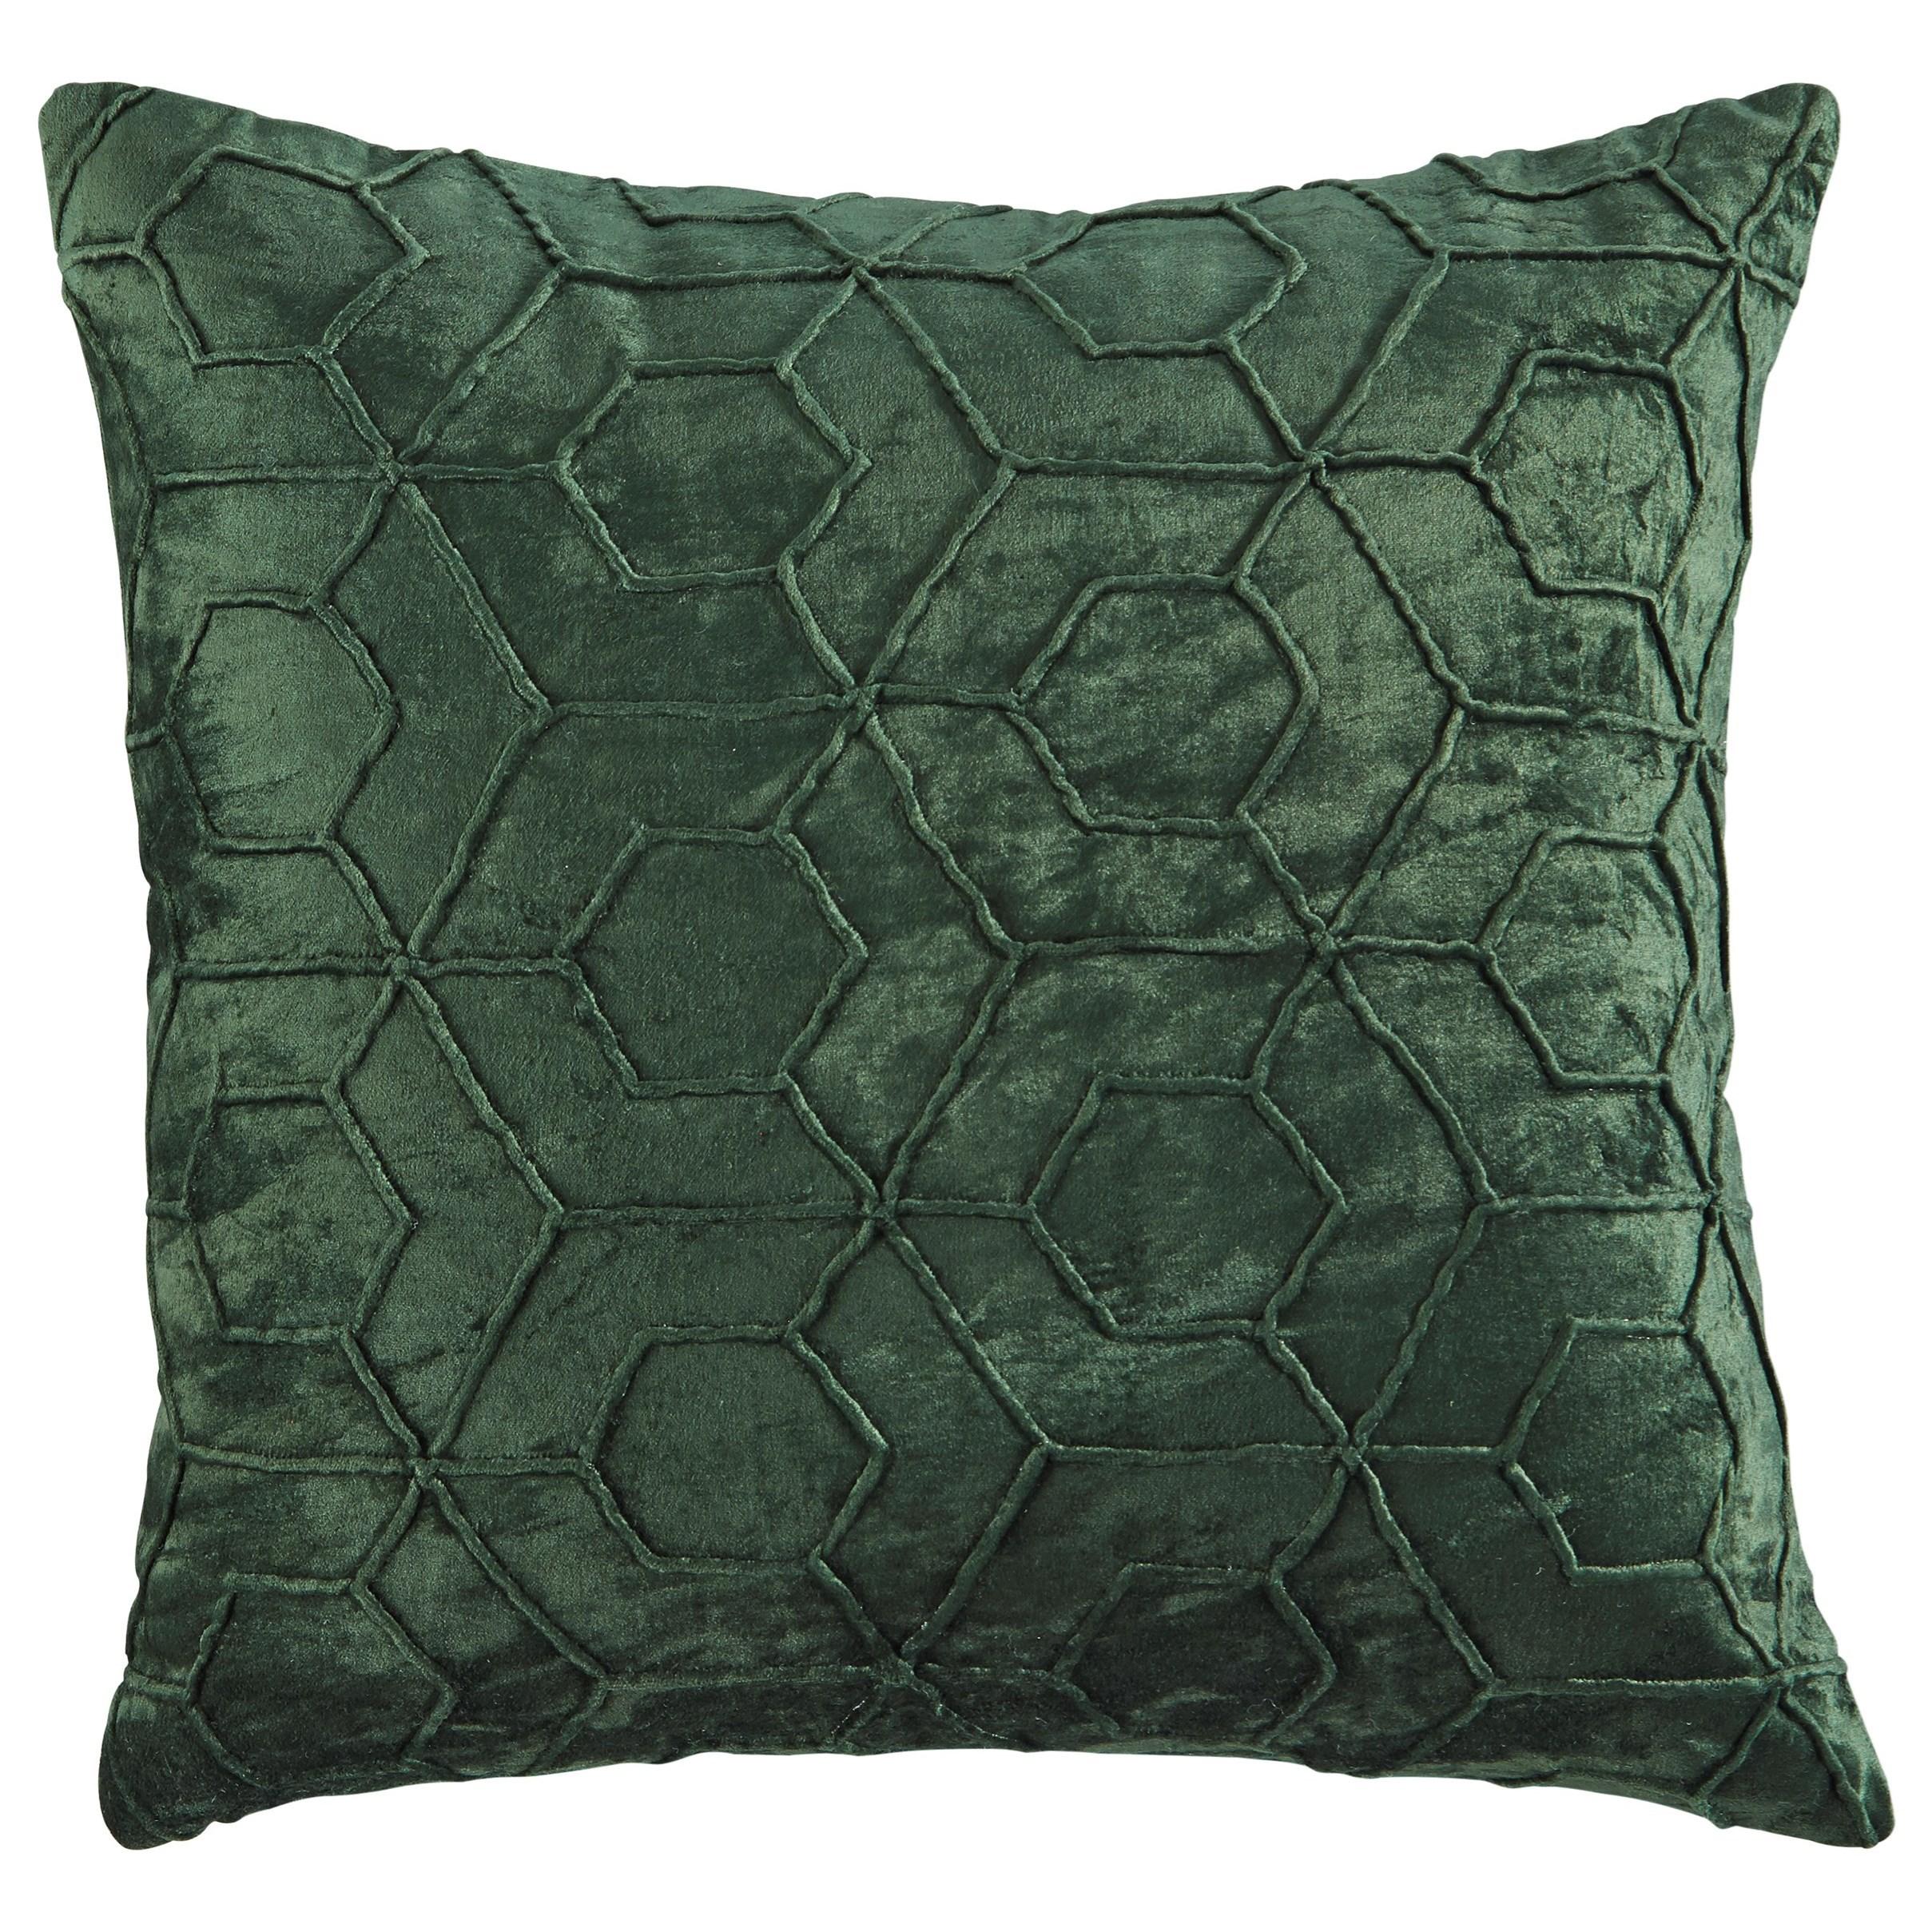 Pillows Ditman Emerald Pillow by Vendor 3 at Becker Furniture